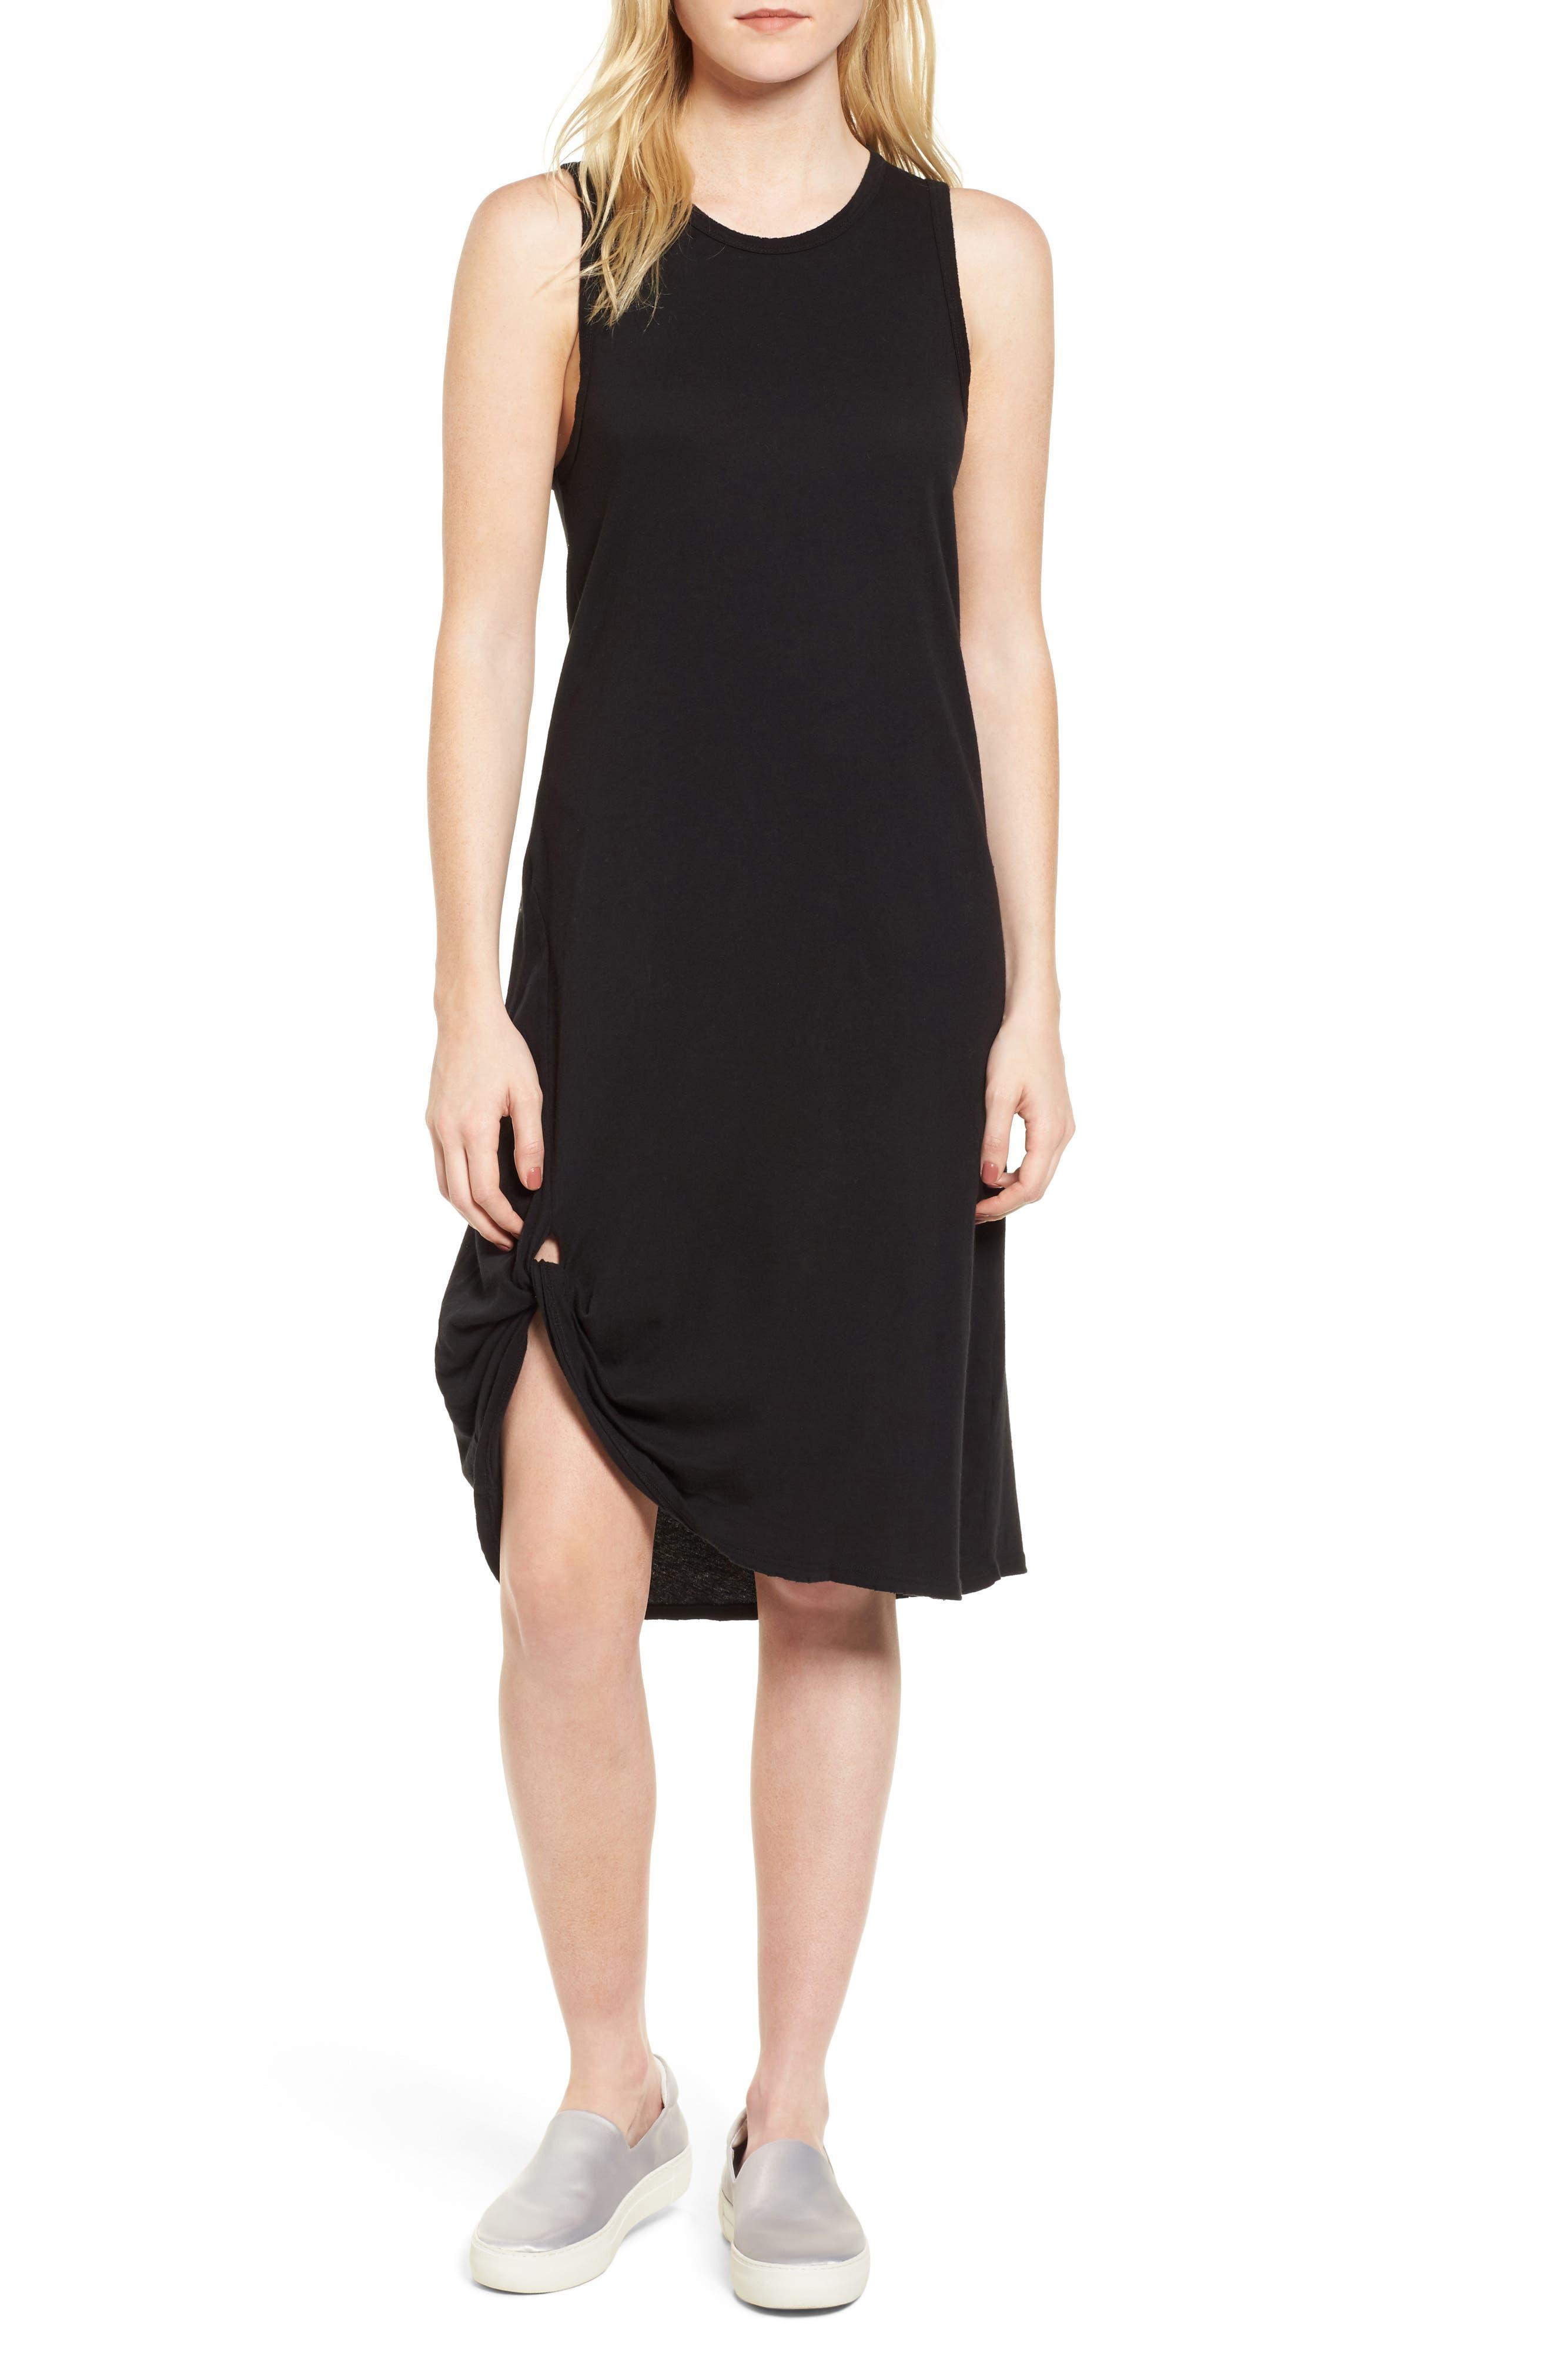 Boo Jersey Tank Dress,                             Main thumbnail 1, color,                             001